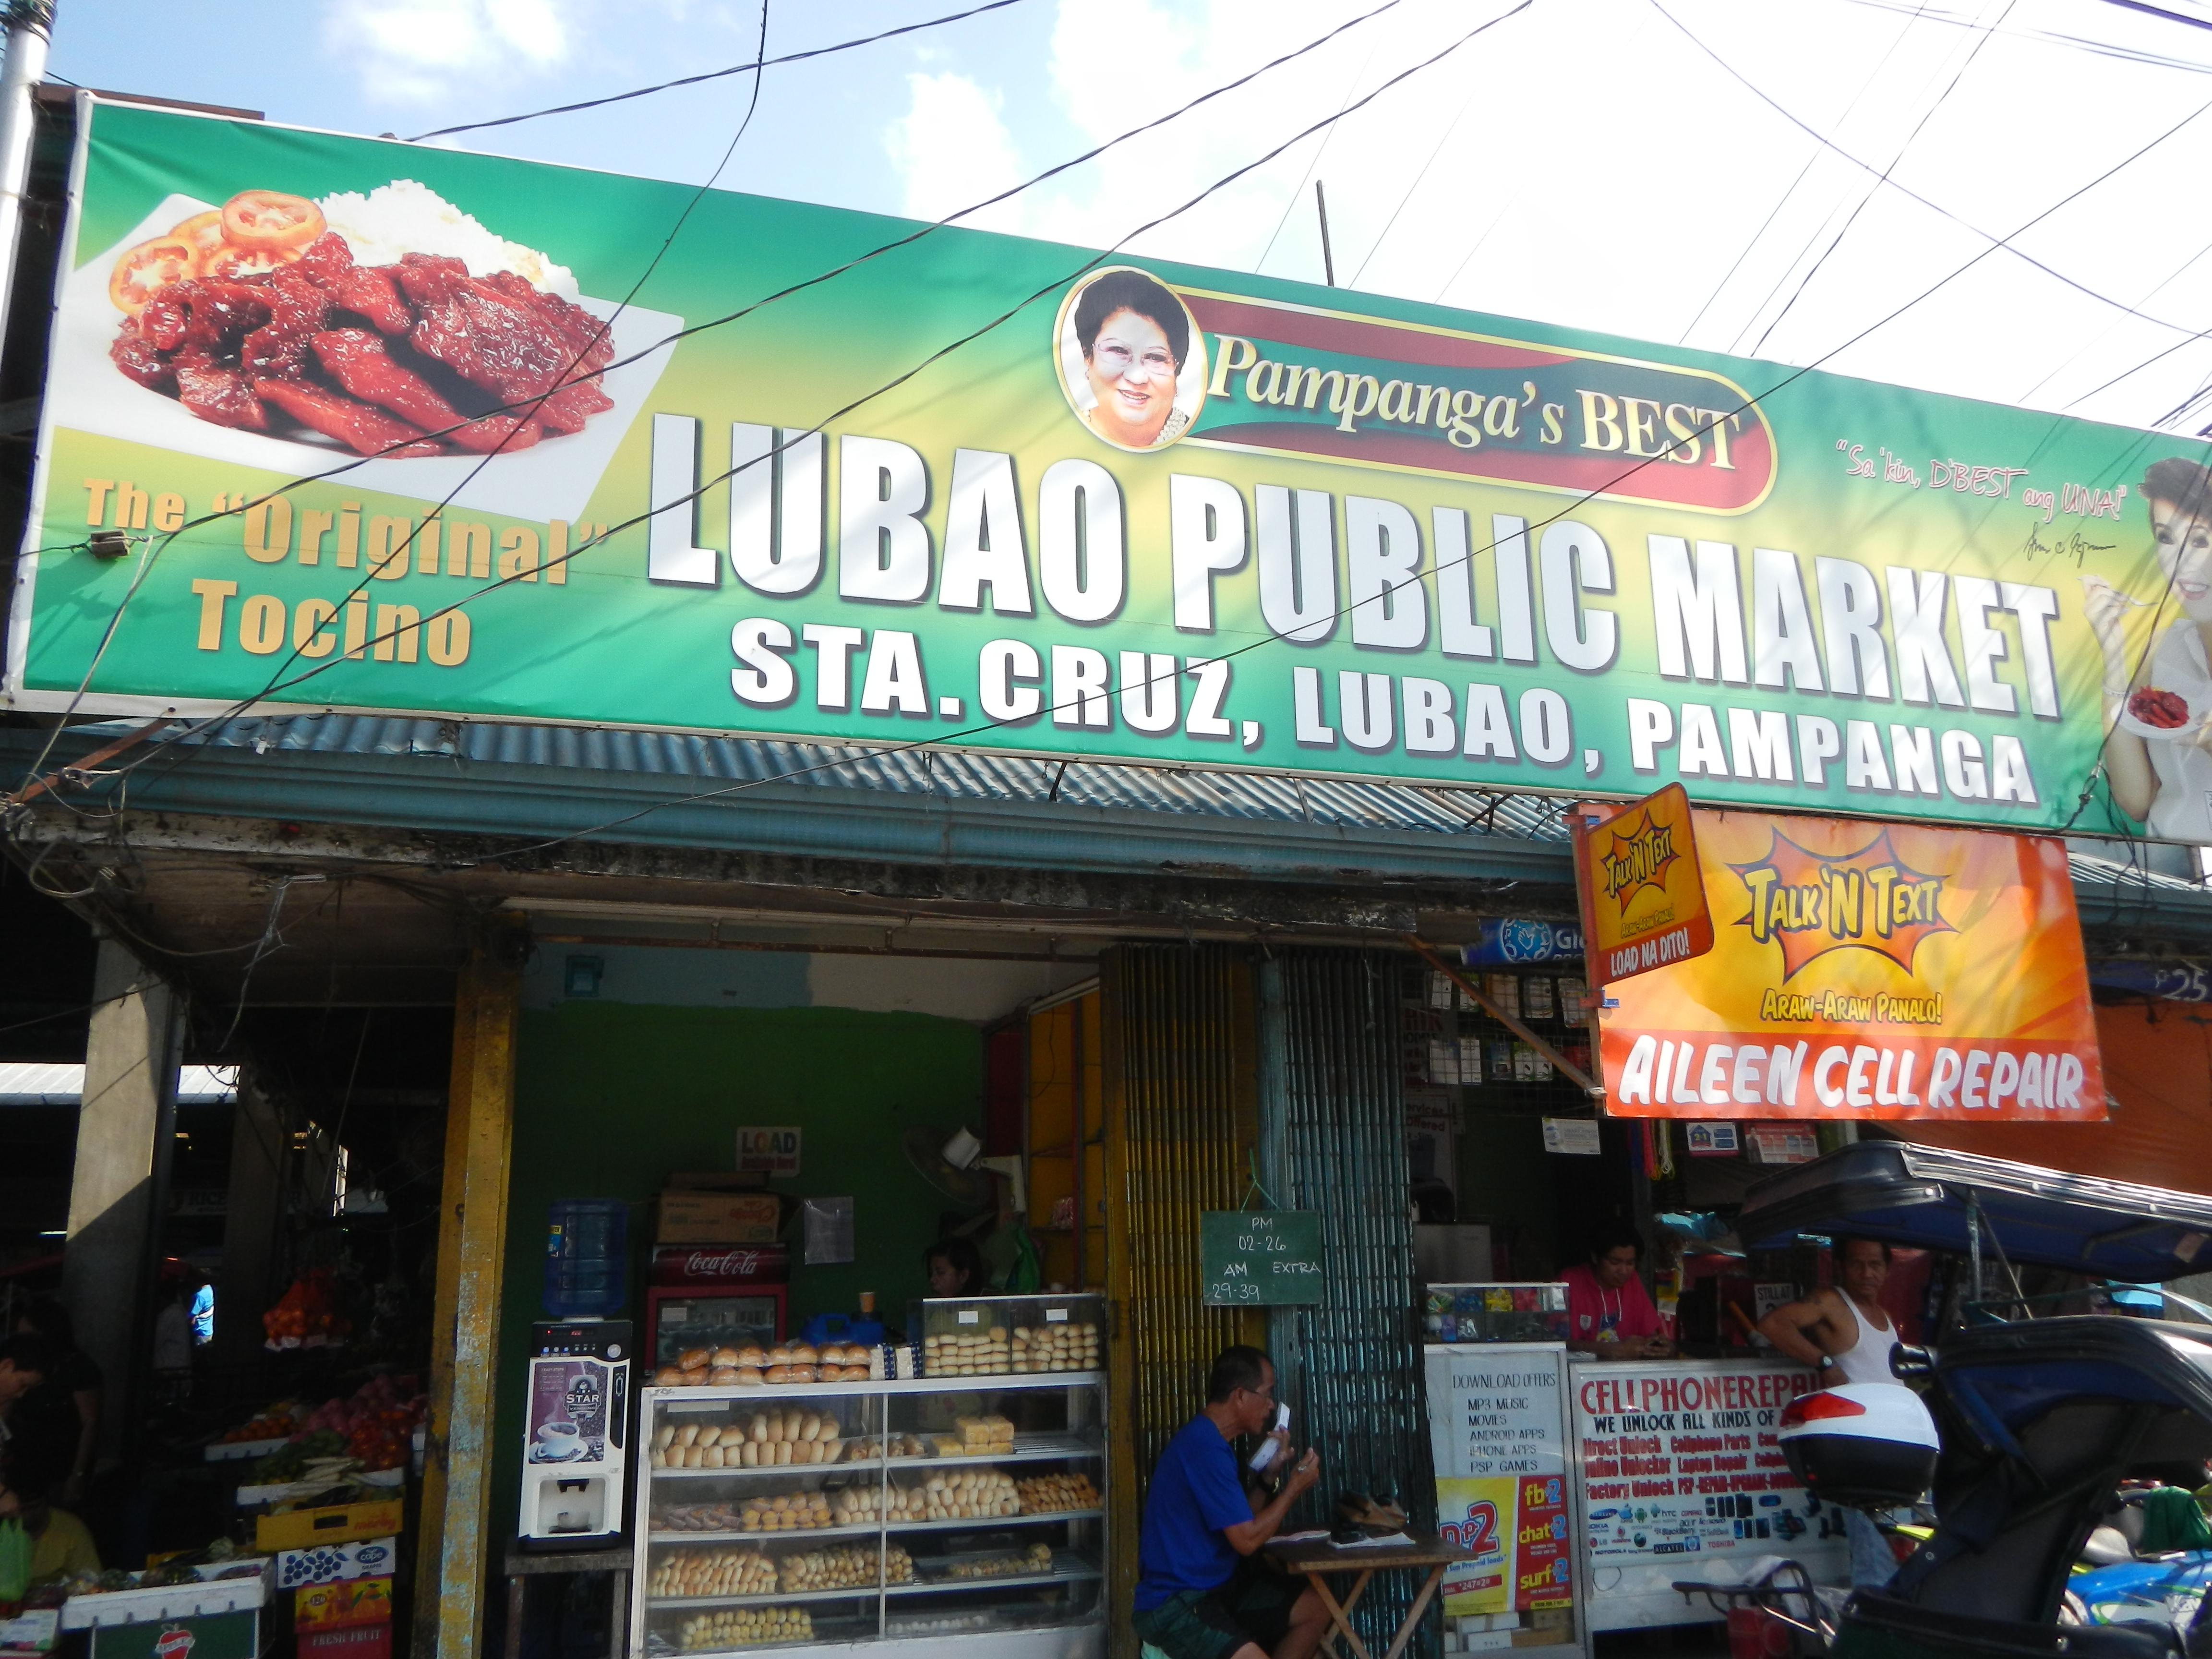 Filejf09770lubao Santa Cruz Proper Market Pampangafvf 04jpg